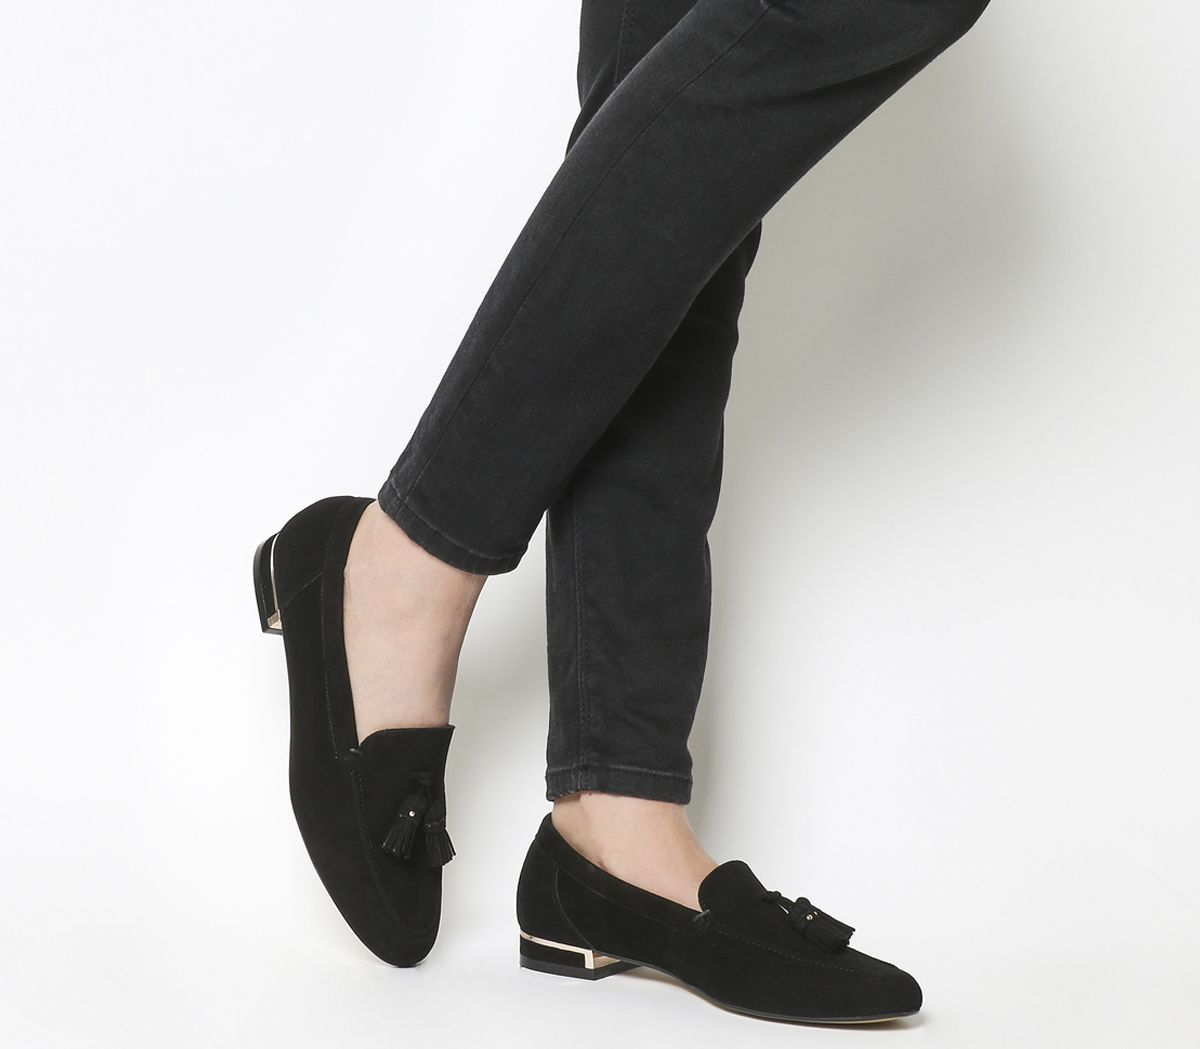 4b71b0934b5 Office Retro Tassel Loafers Black Suede Rose Gold Heel - Flats